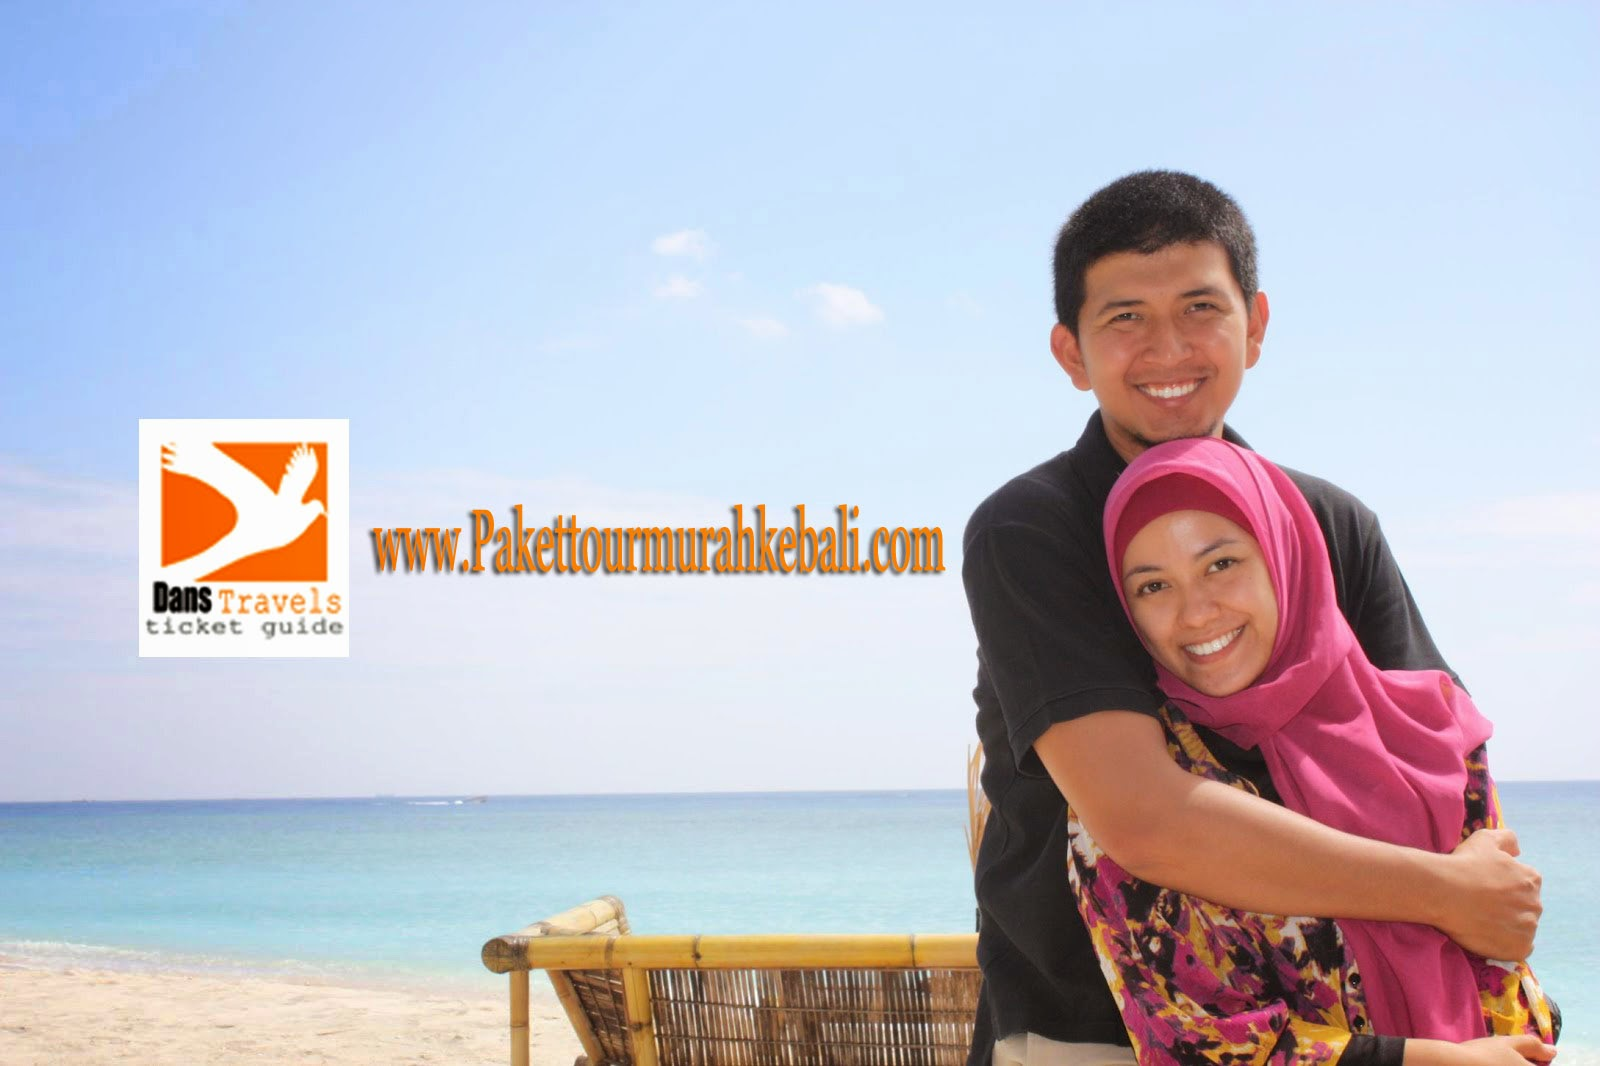 Tiket Fast Boat Gili Air, Gili Trawangan, Gili Air, Lombok, Senggigi